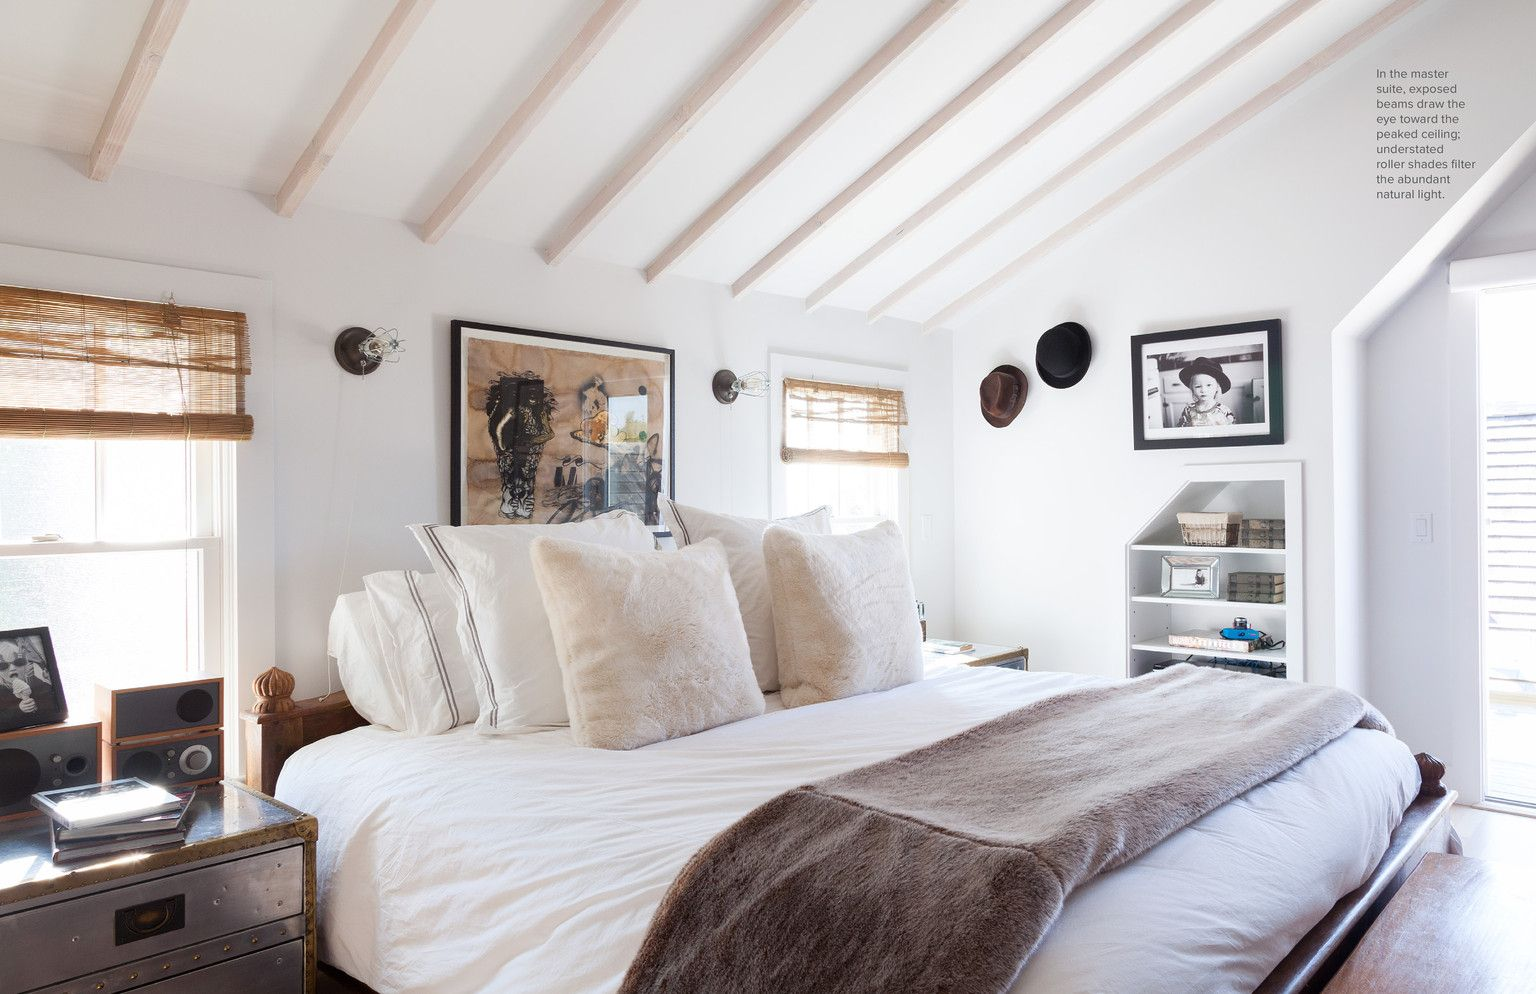 July August 2013 Lonny Magazine Lonny Bamboo Roller Shades Serene Bedroom Home Bedroom Home Cool bedroom ideas lonny